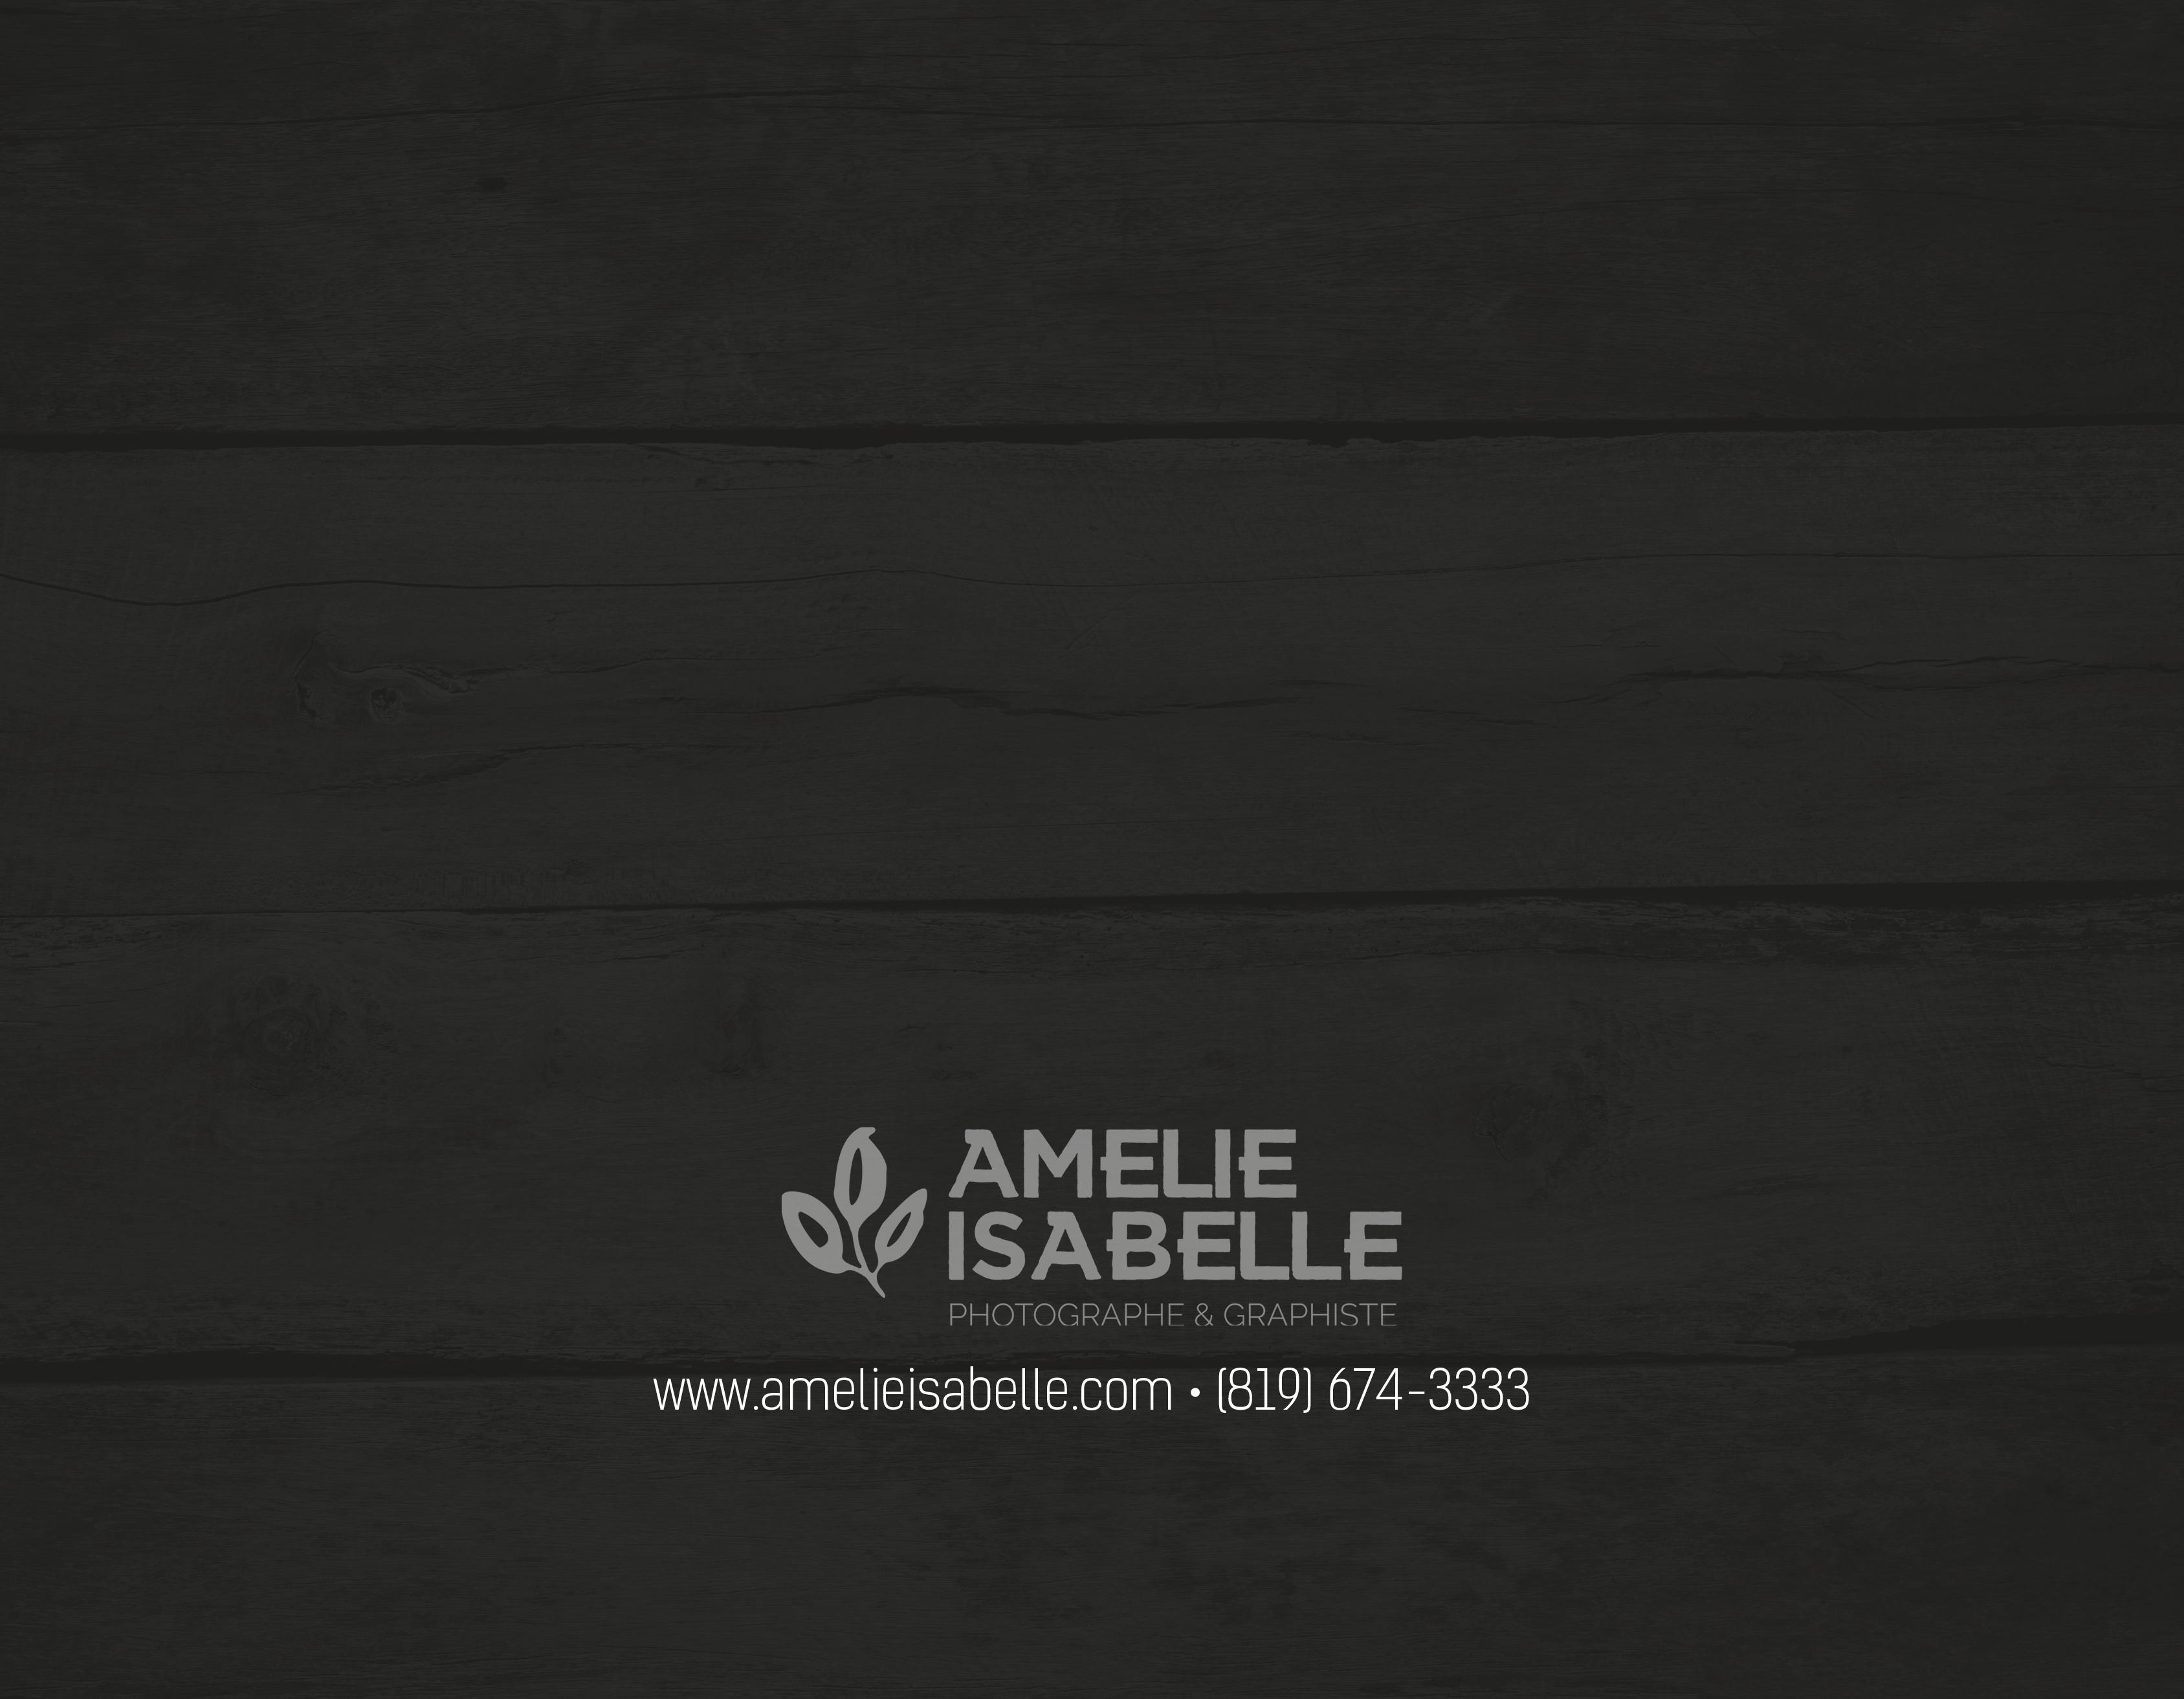 PORTFOLIO_ISABELLE_AMELIE14